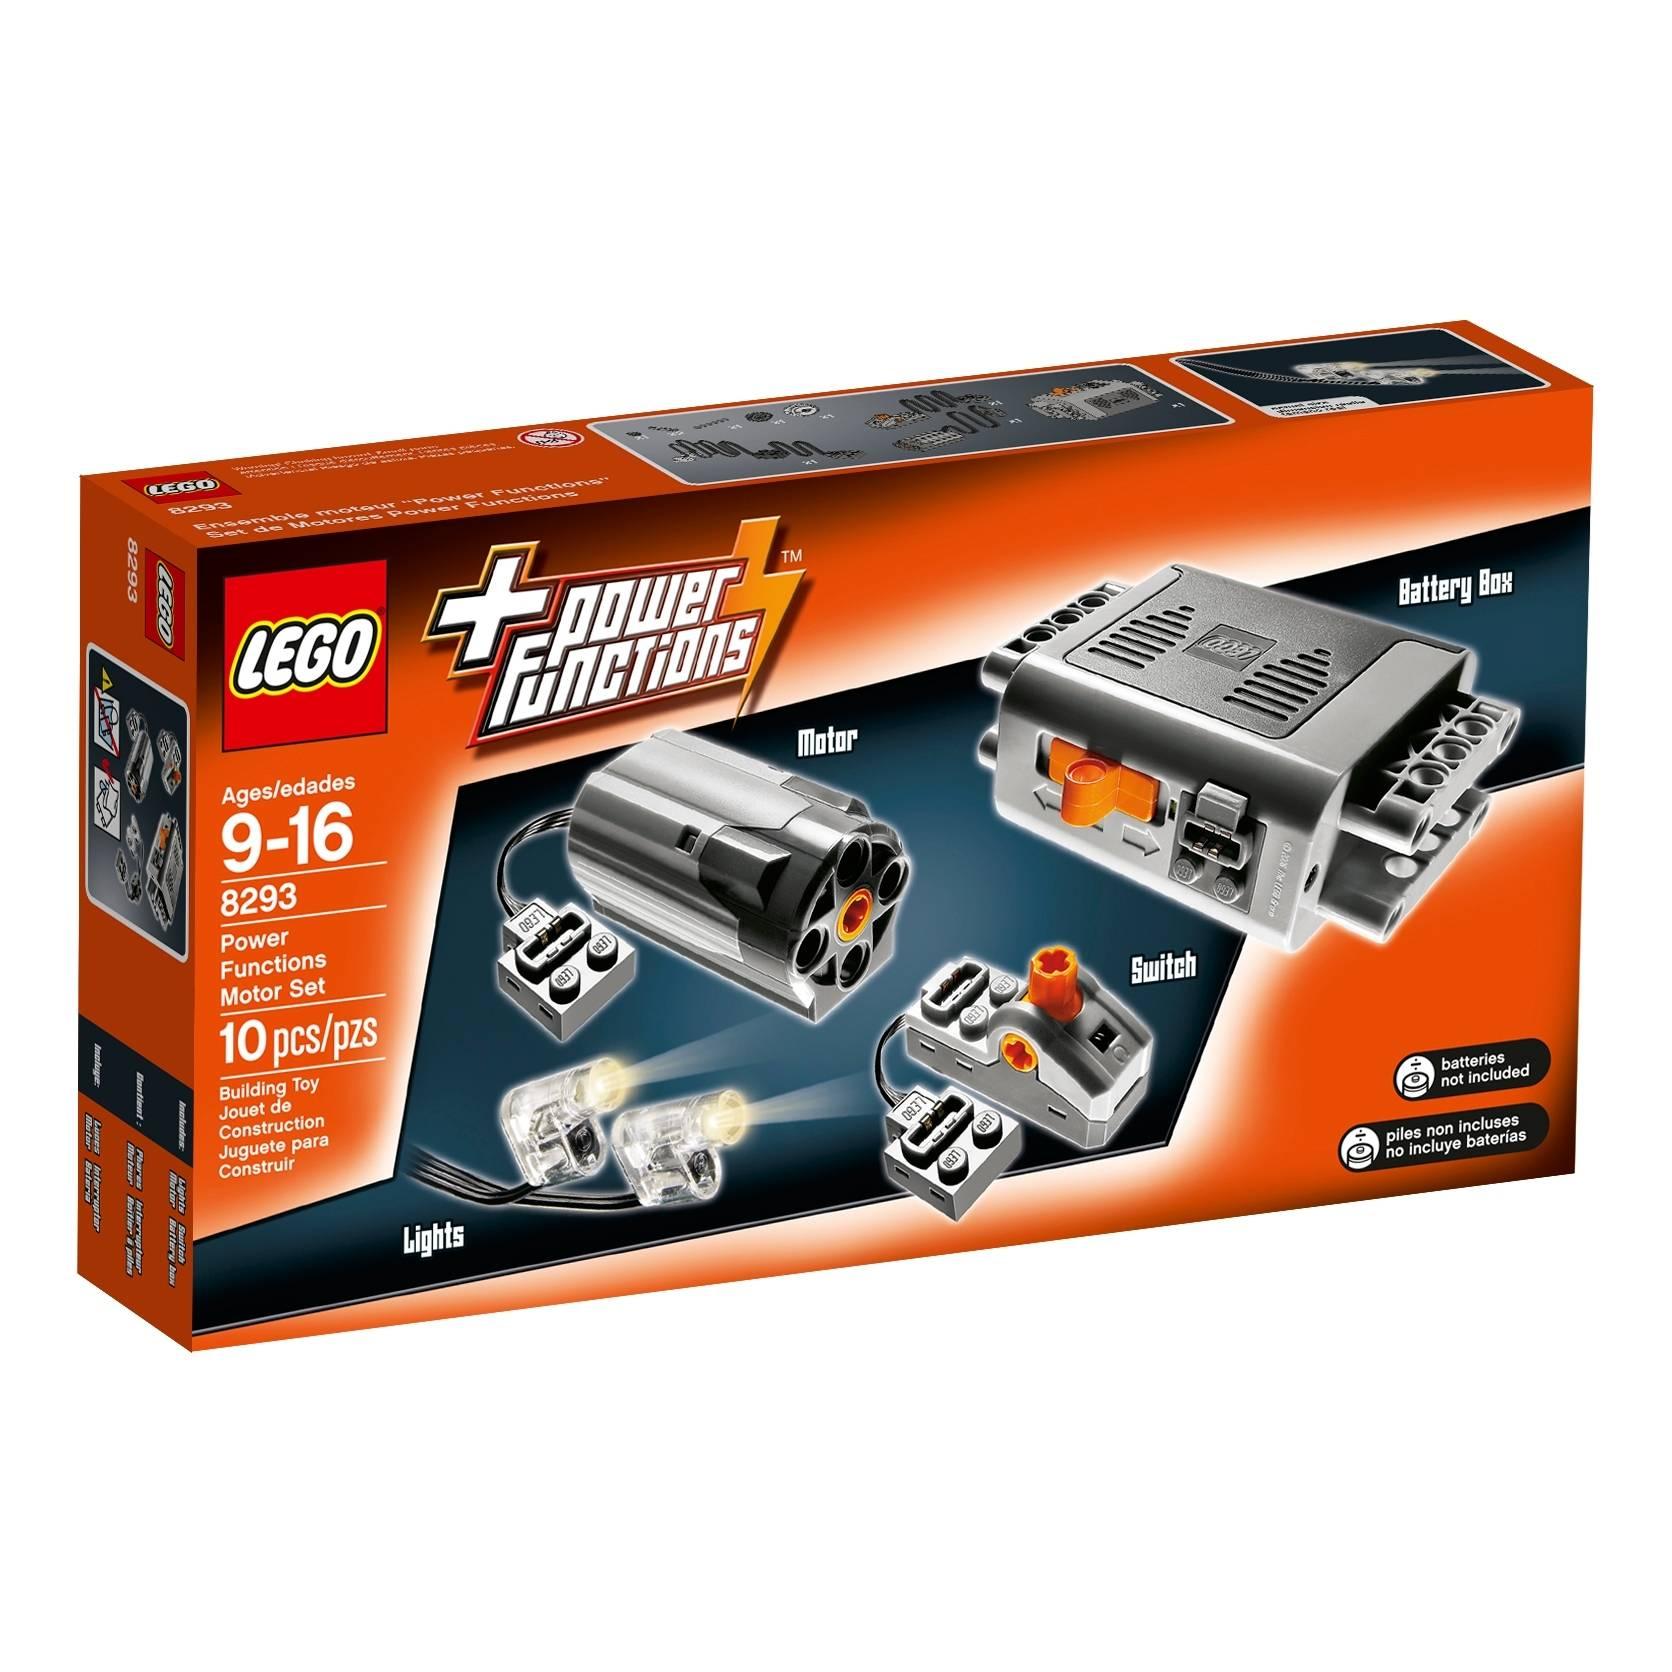 LEGO Technic Power Function Accessory Box